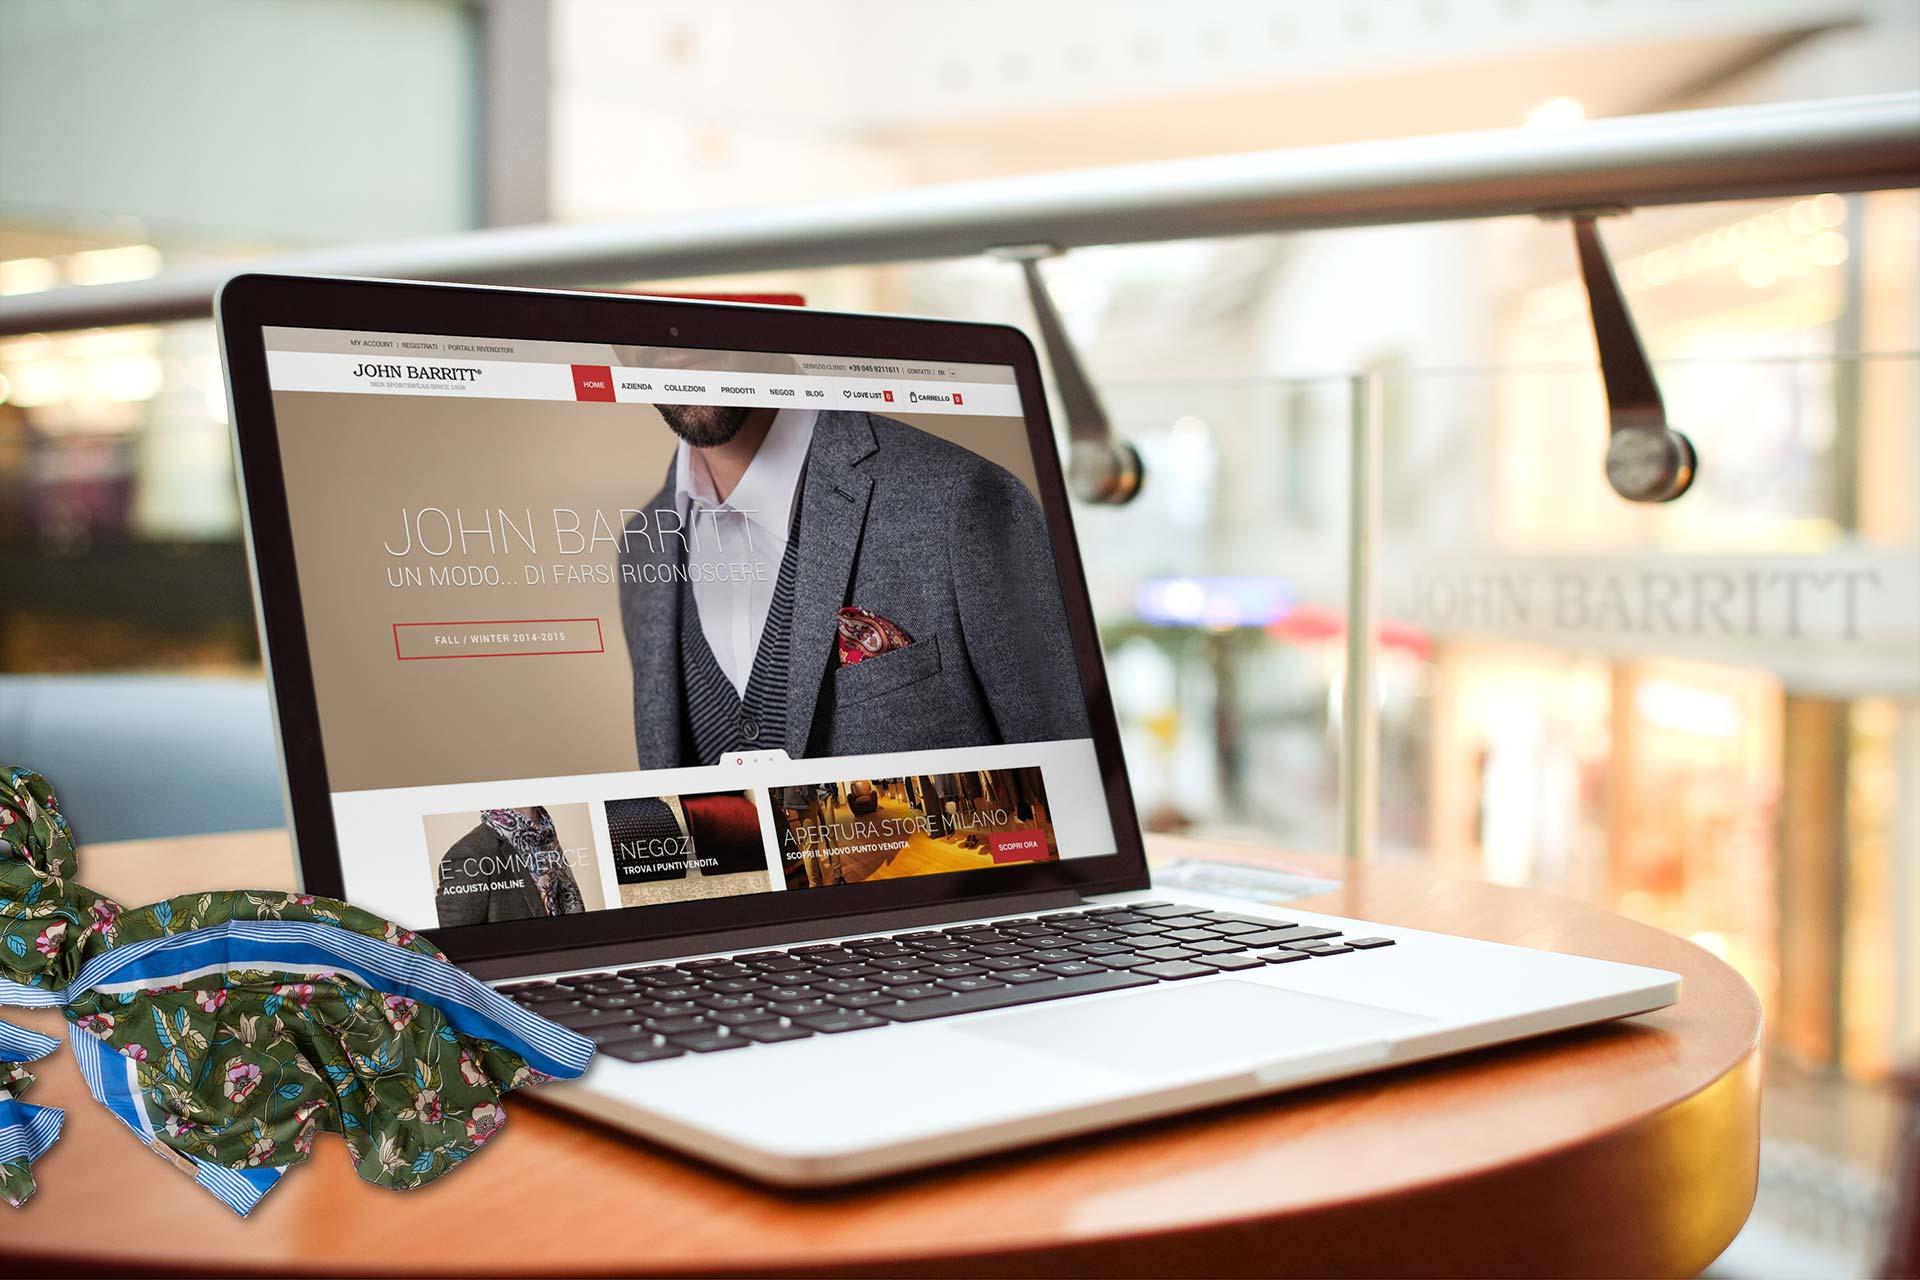 SITI WEB & ECOMMERCE